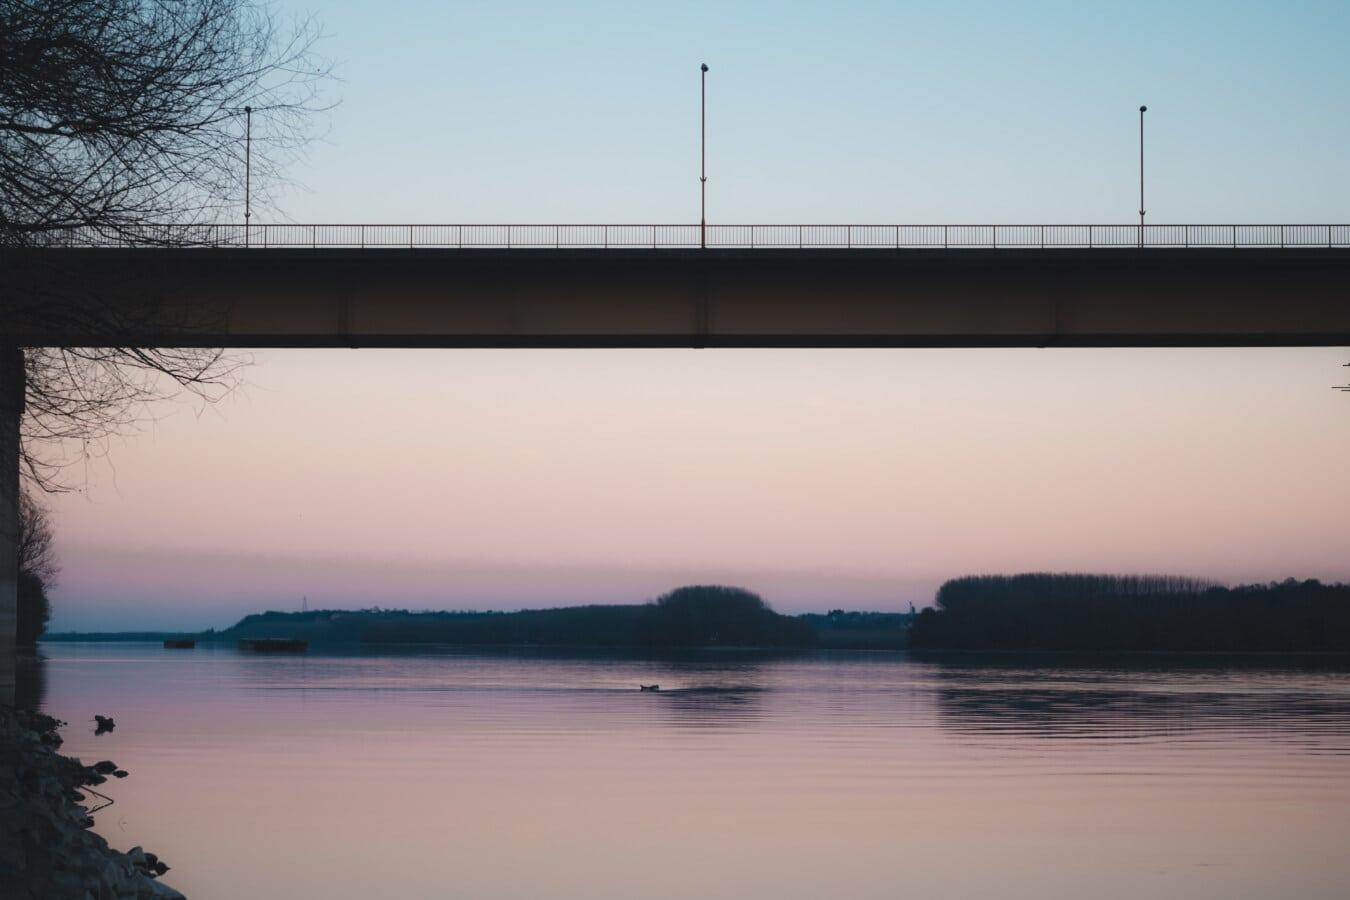 bridge, twilight, reflection, Danube, river, dawn, water, dusk, lake, landscape